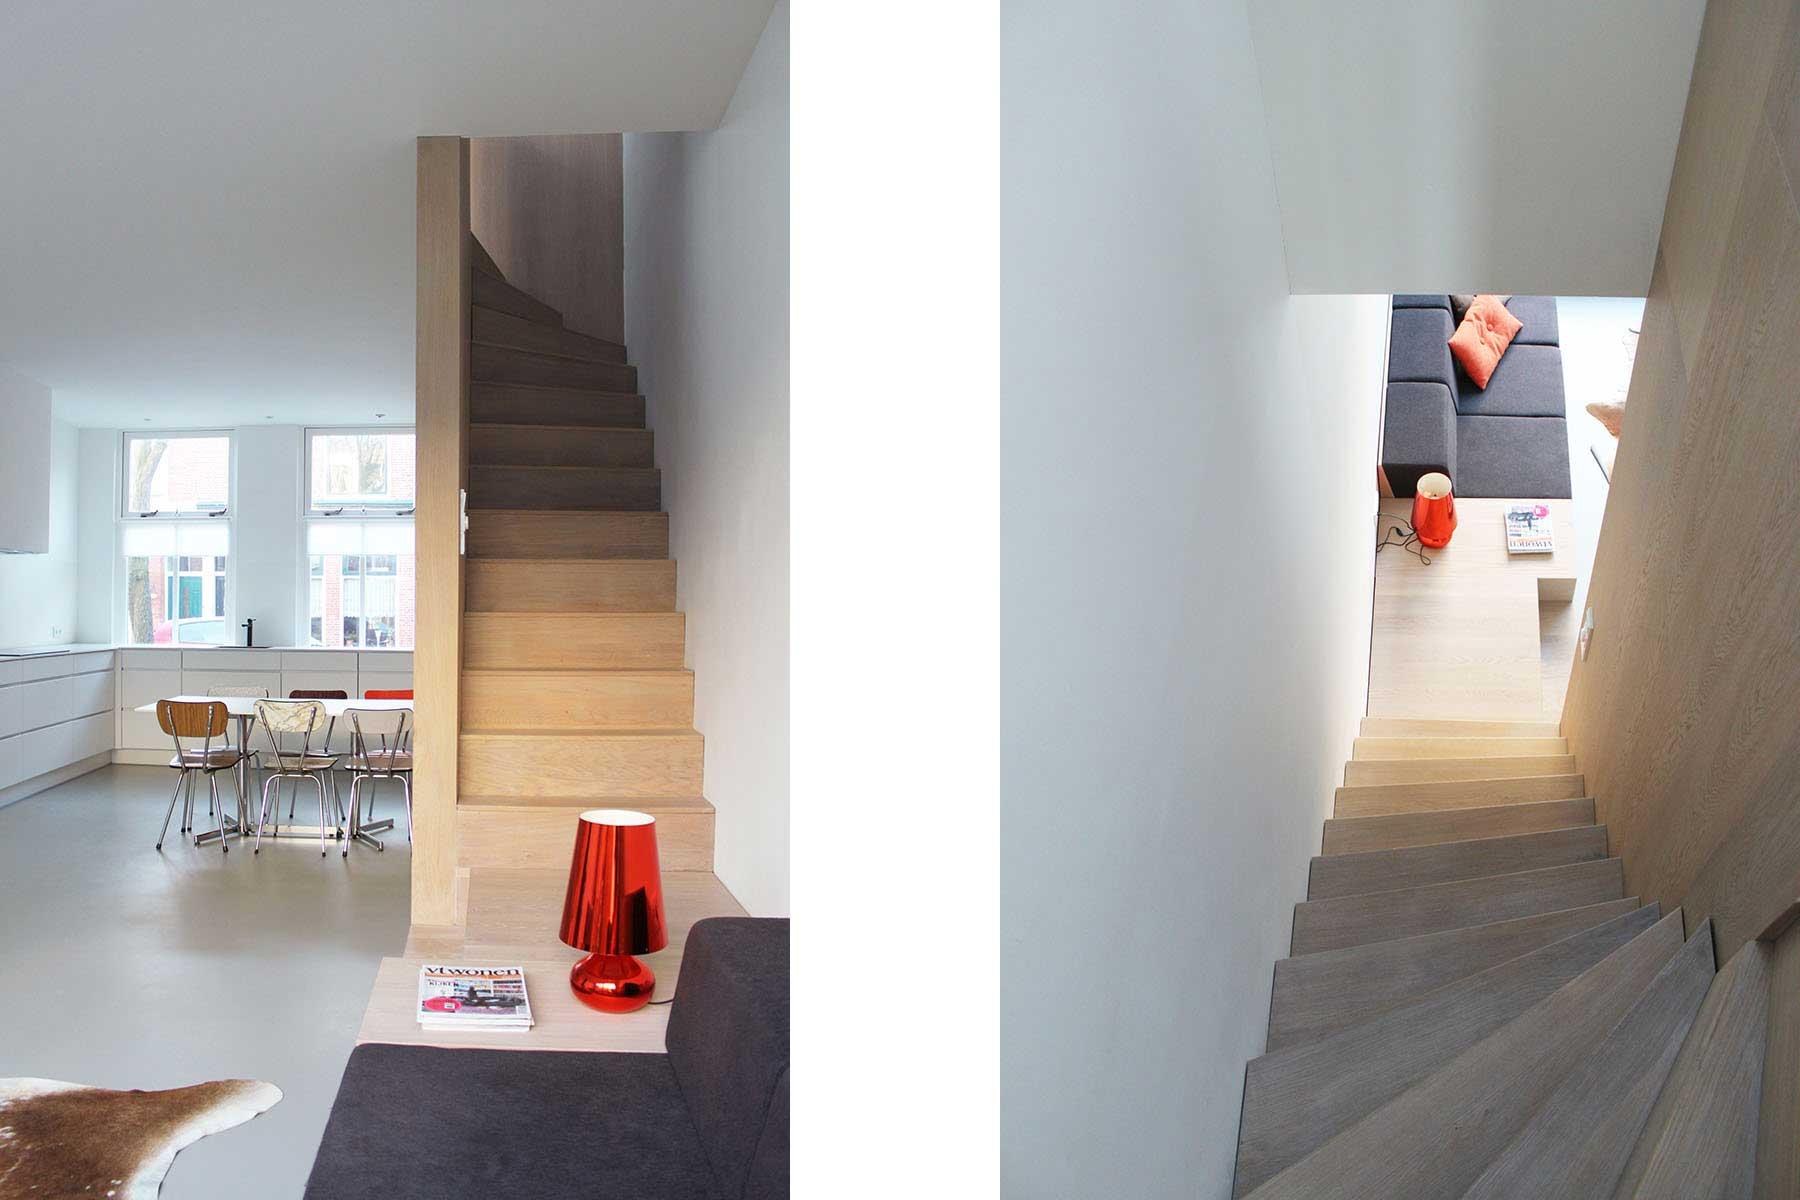 8A-Architecten-verbouwing-arbeiderswoning-04